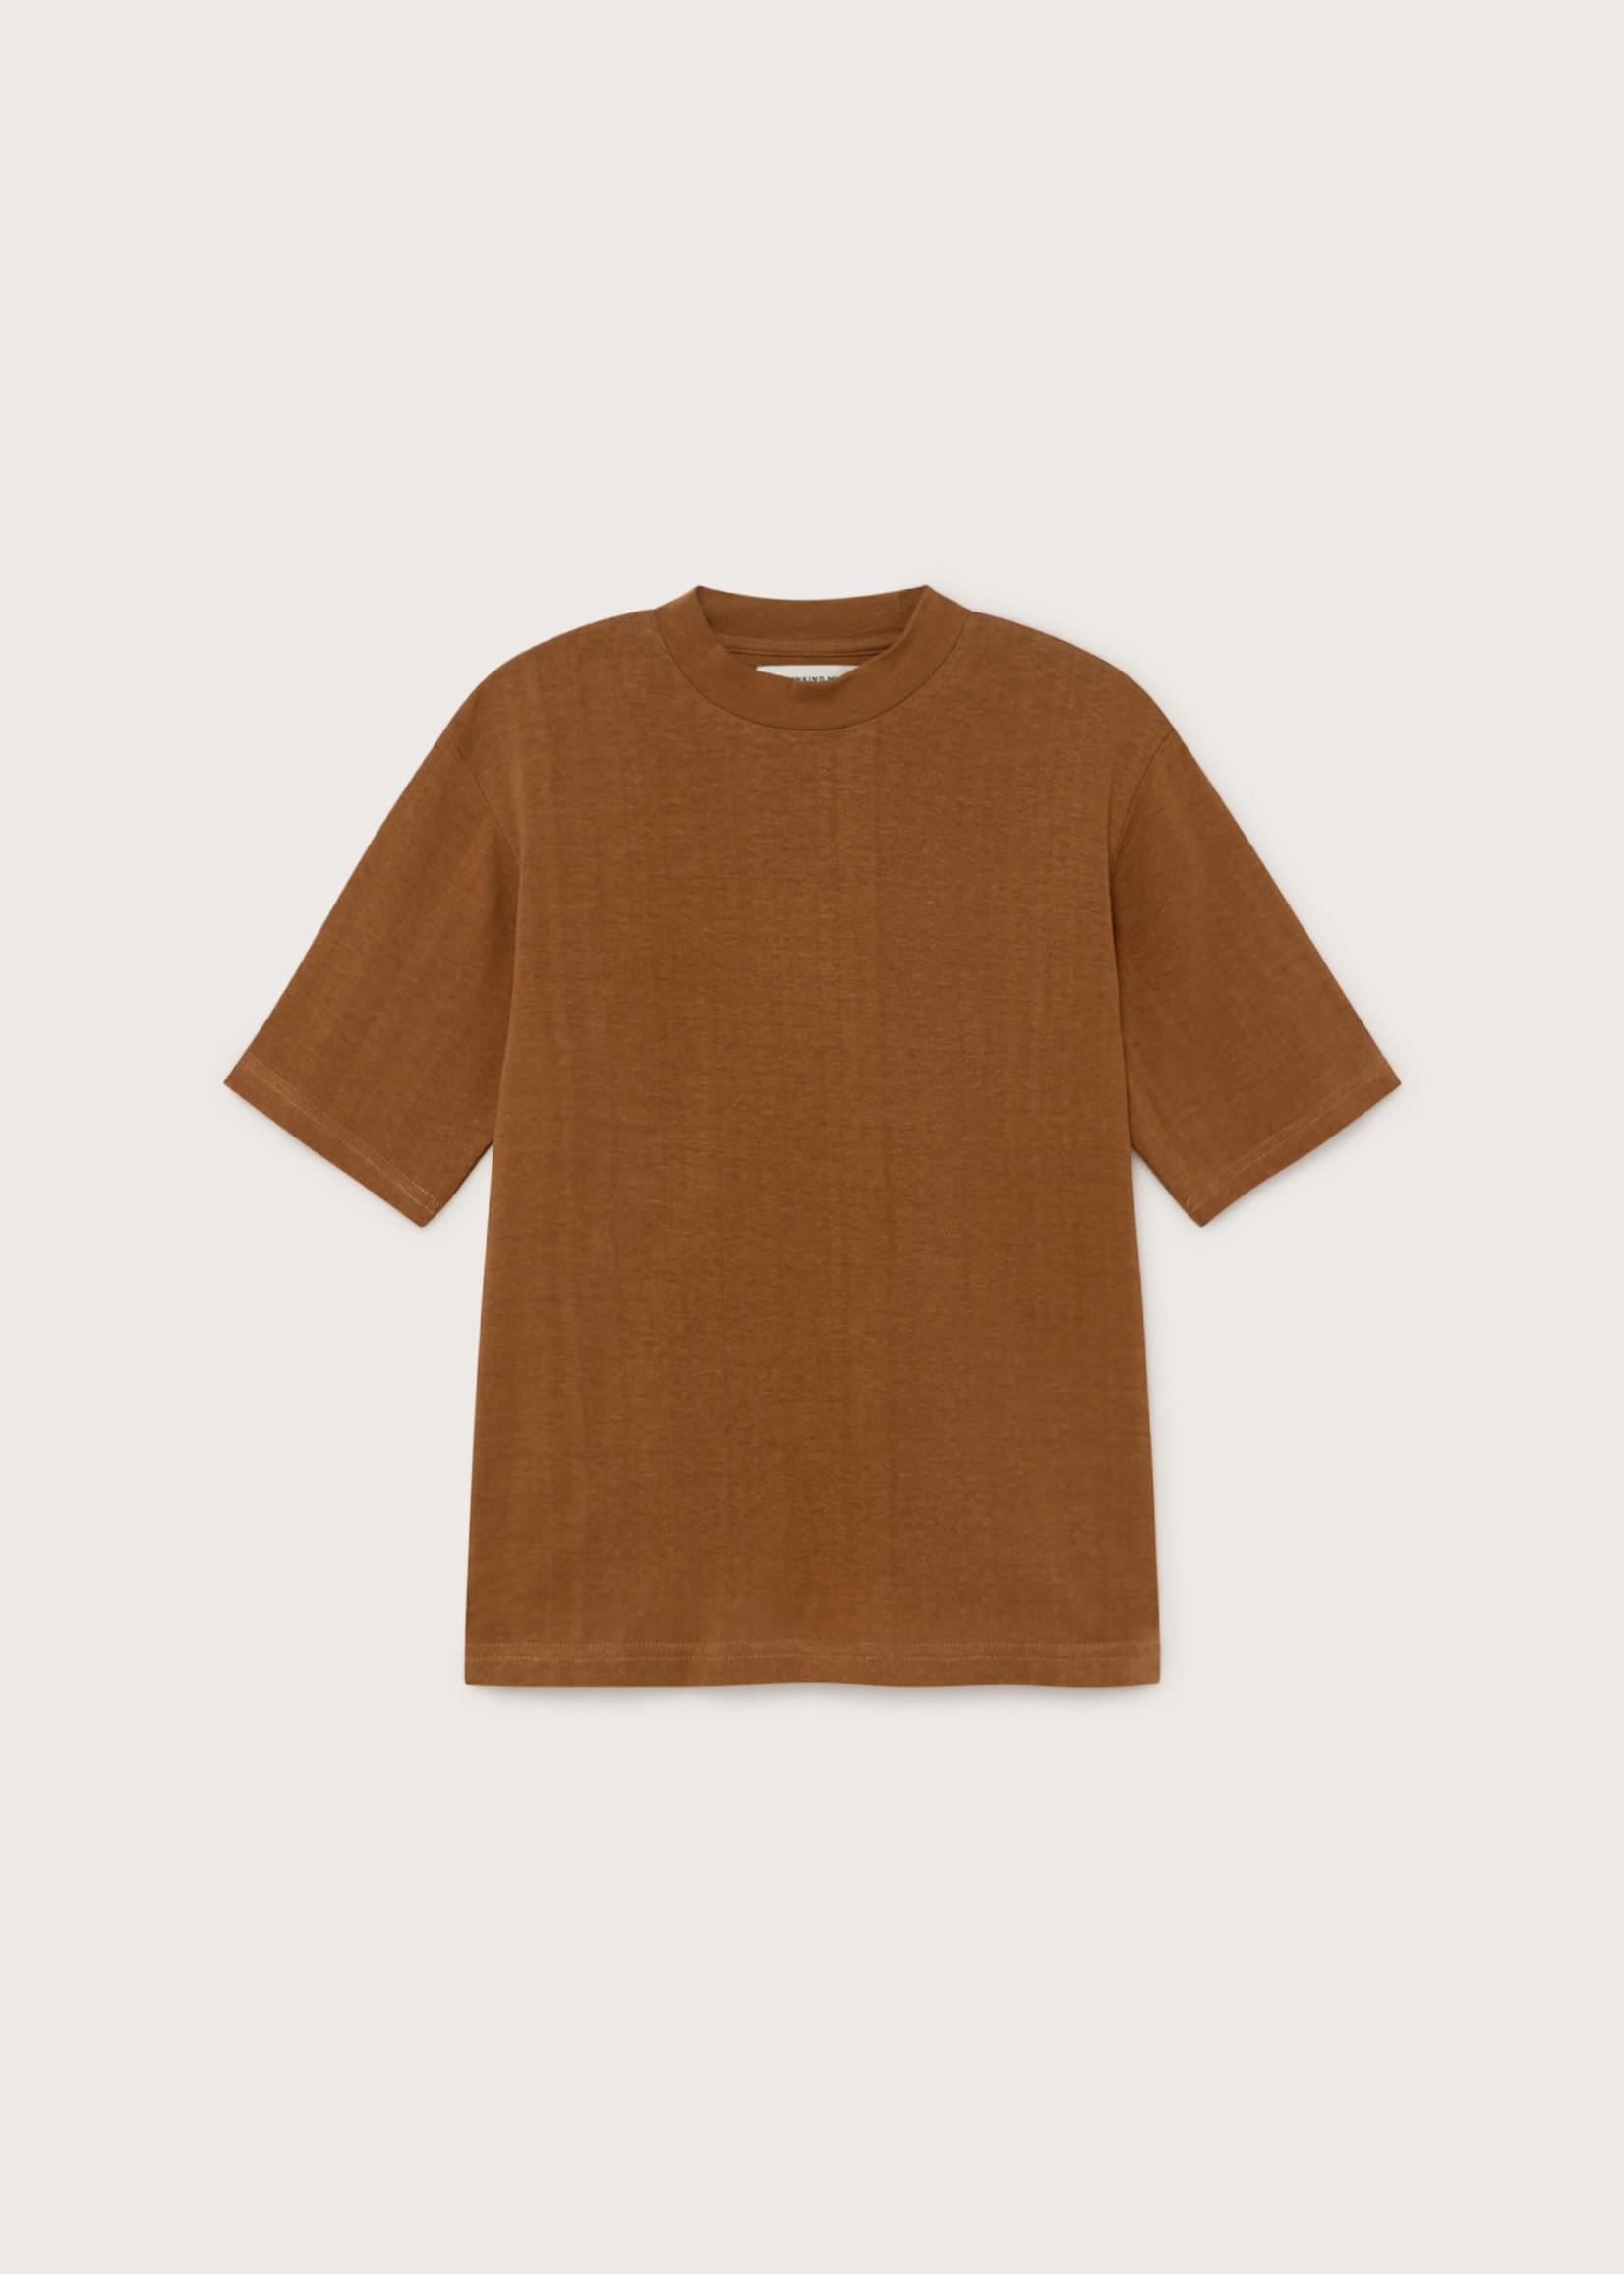 Thinking Mu Caramel Hemp Aidin T-shirt